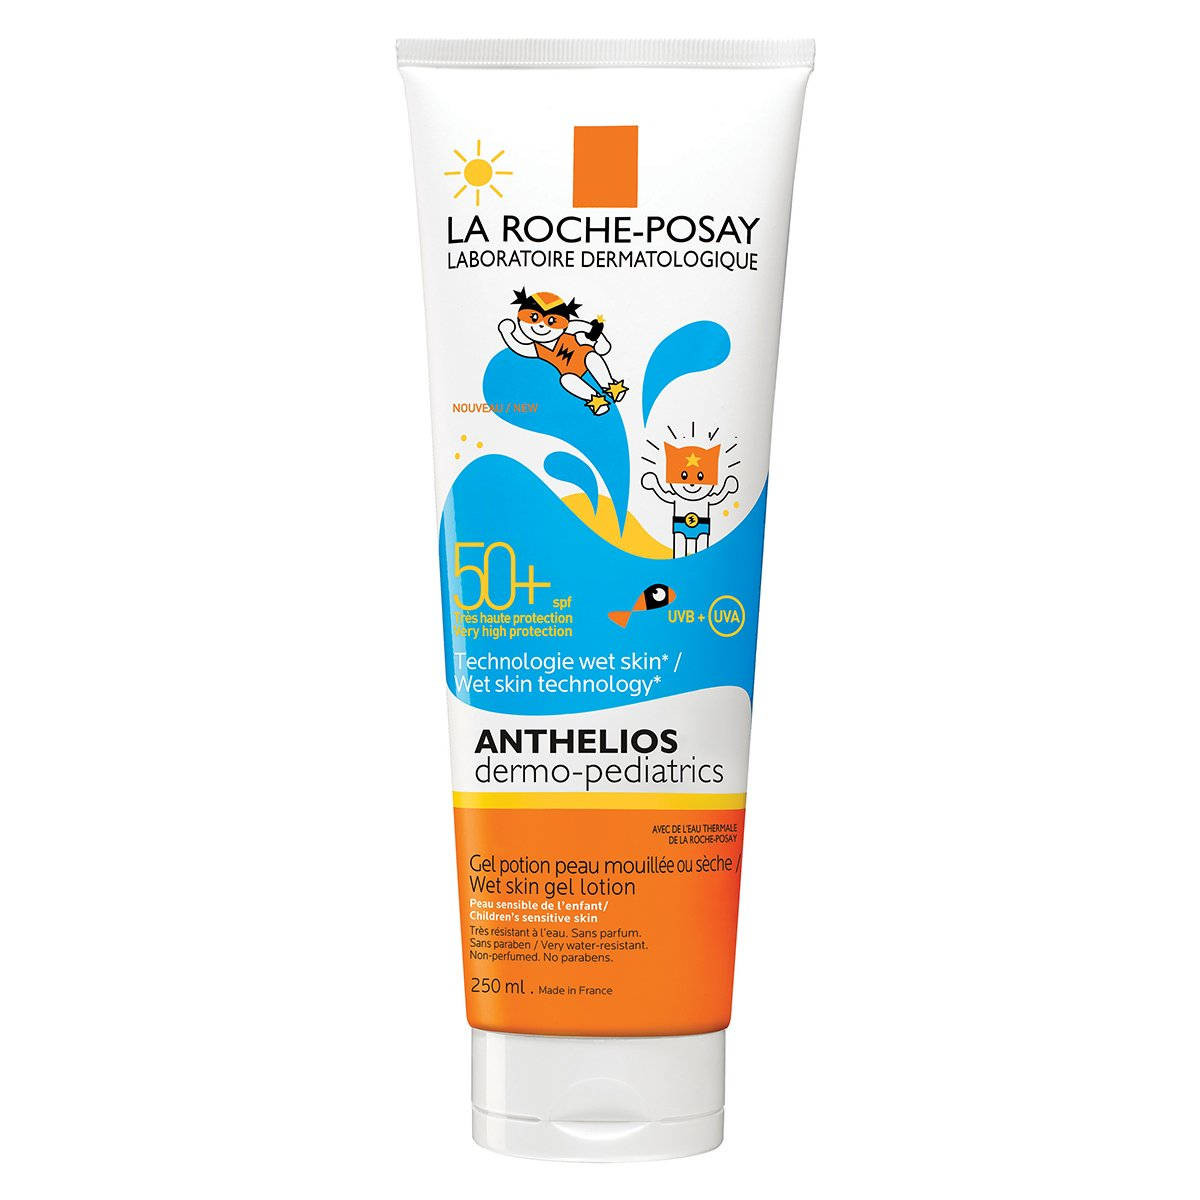 Anthelios Dermo-Pediatrics Gel Wet Skin SPF 50250ml La Roche Posay La roche-posay 67106